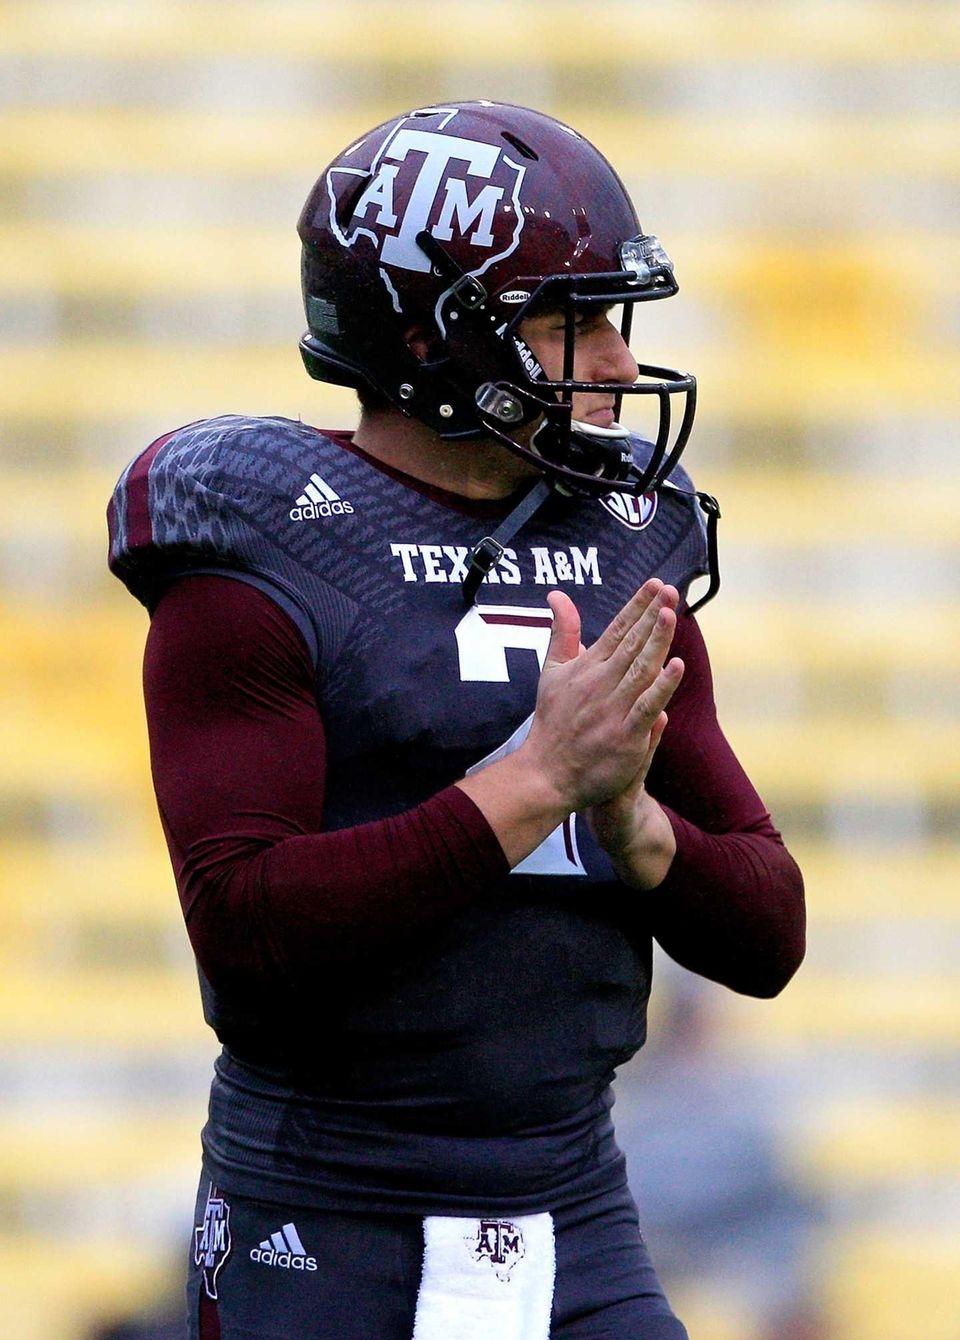 BATON ROUGE, LA - NOVEMBER 23: Quarterback Johnny